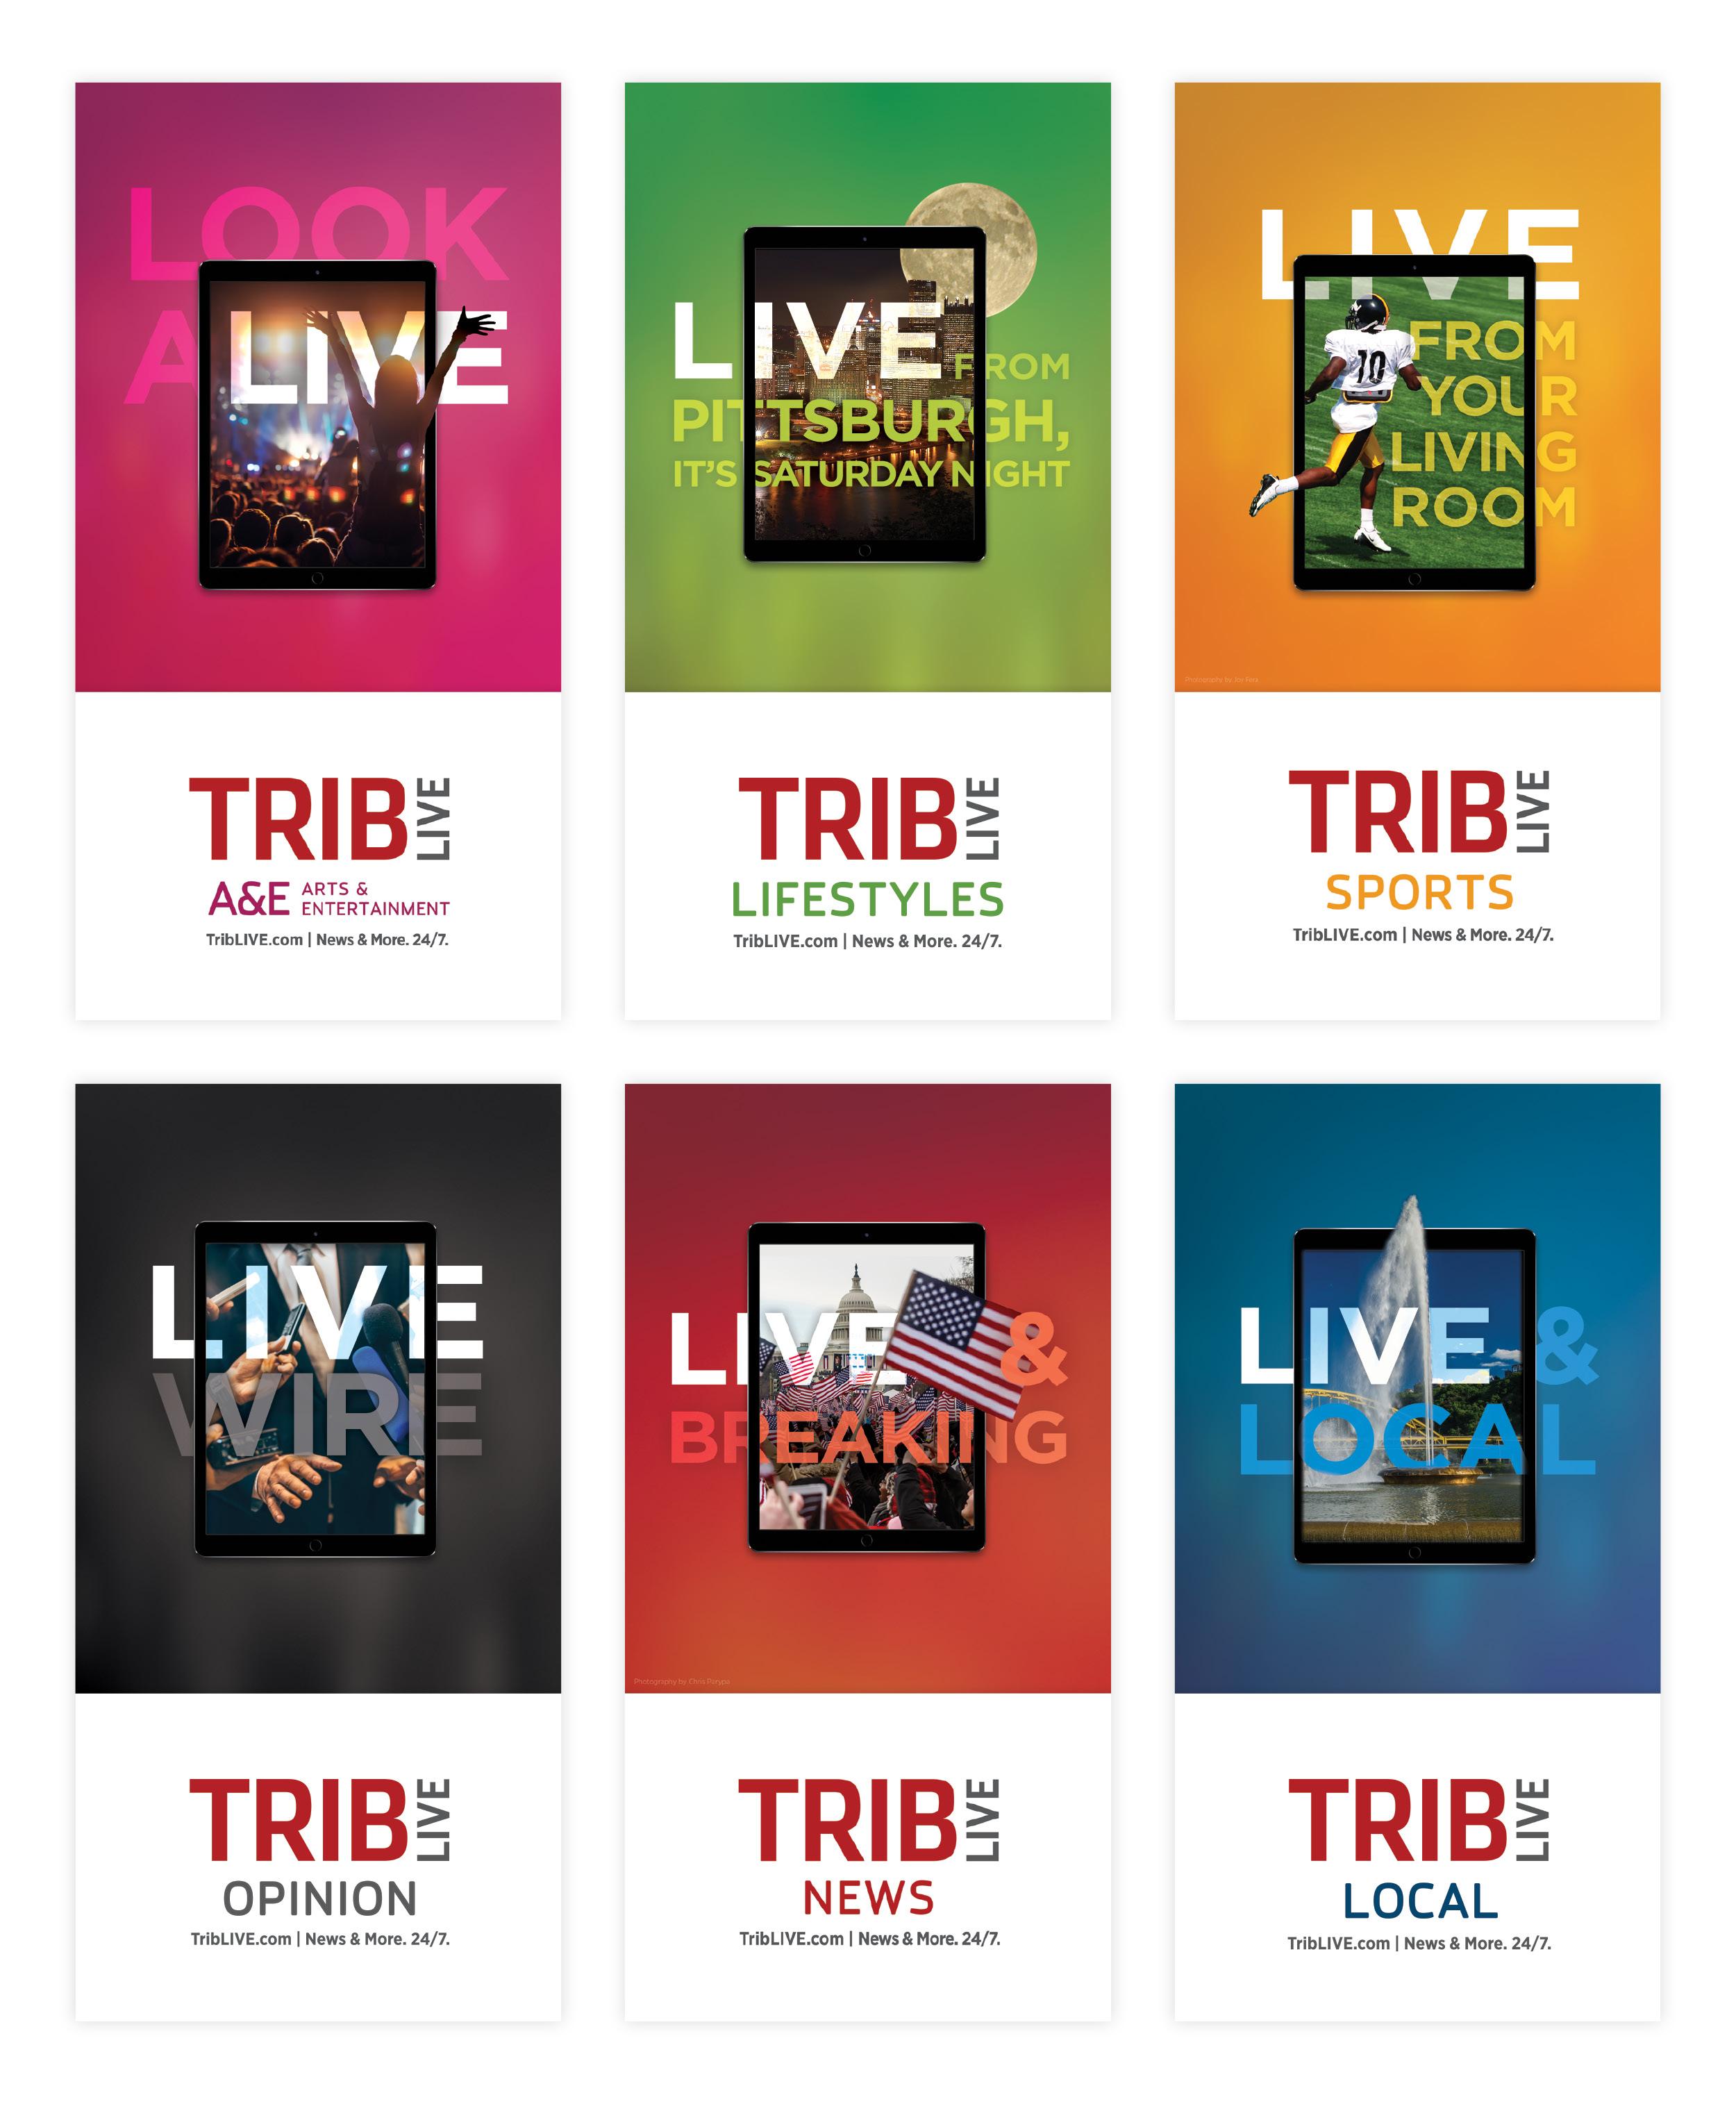 TRIBPages_.jpg